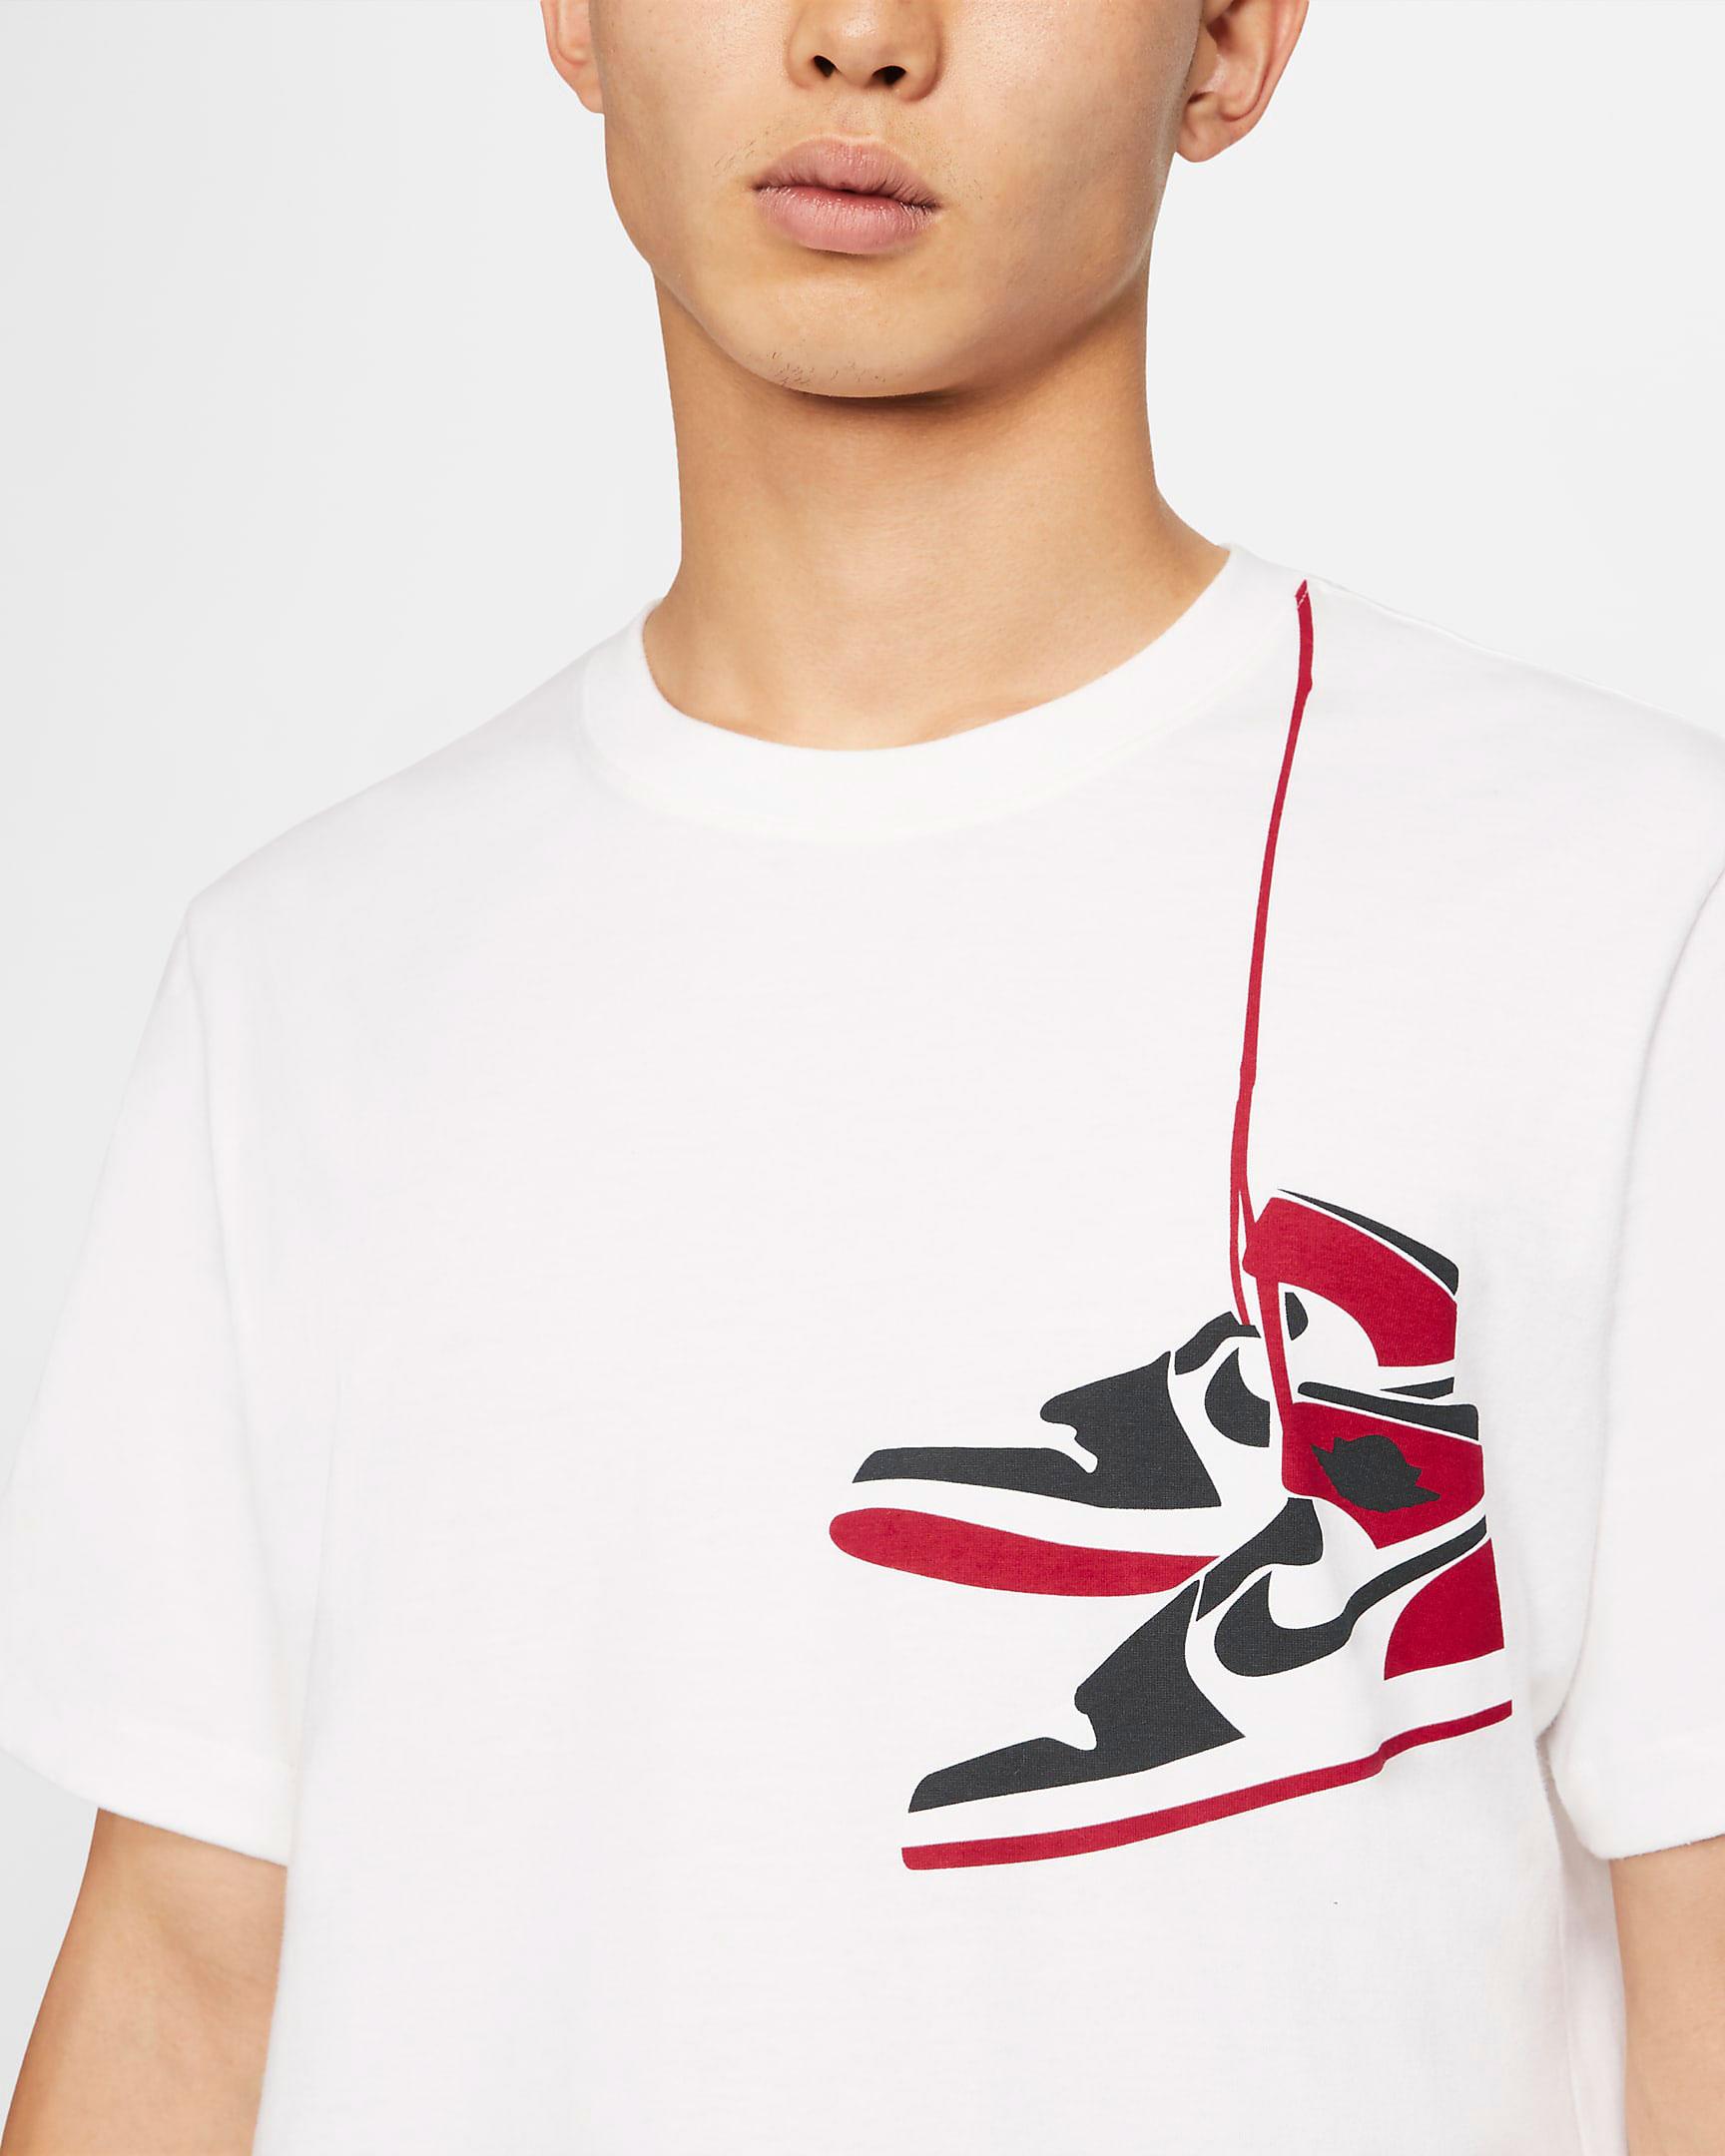 jordan-aj1-knit-stocking-holiday-shirt-white-1